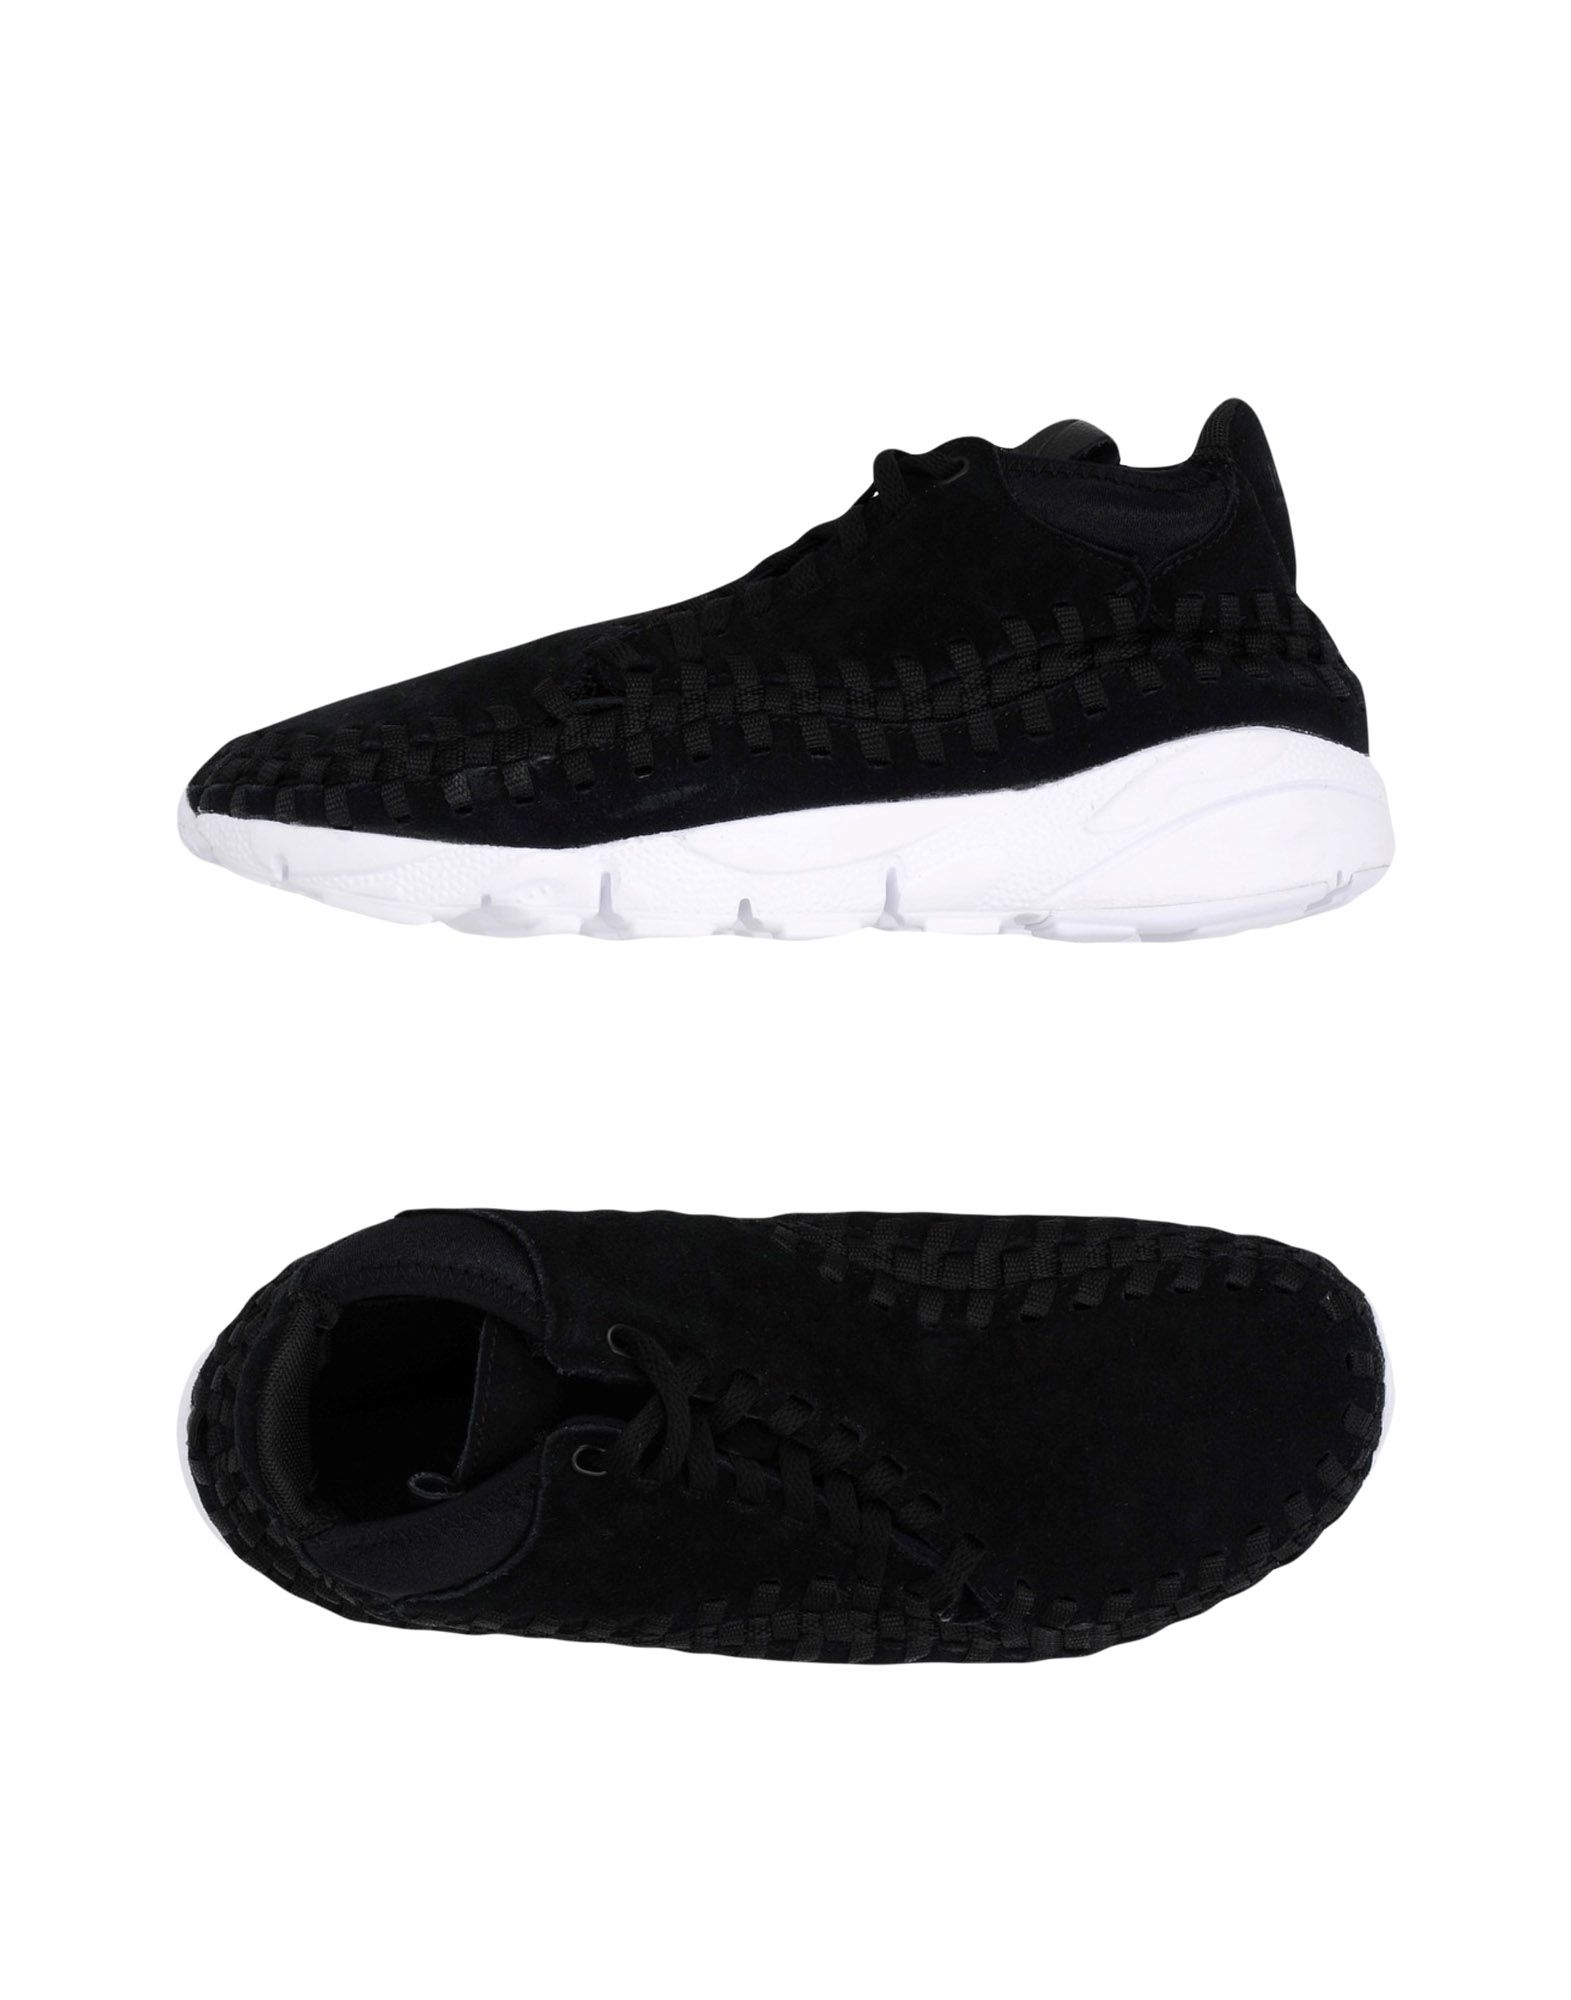 Sneakers Nike Air Footscape Woven Chukka - Uomo - 11379505LO